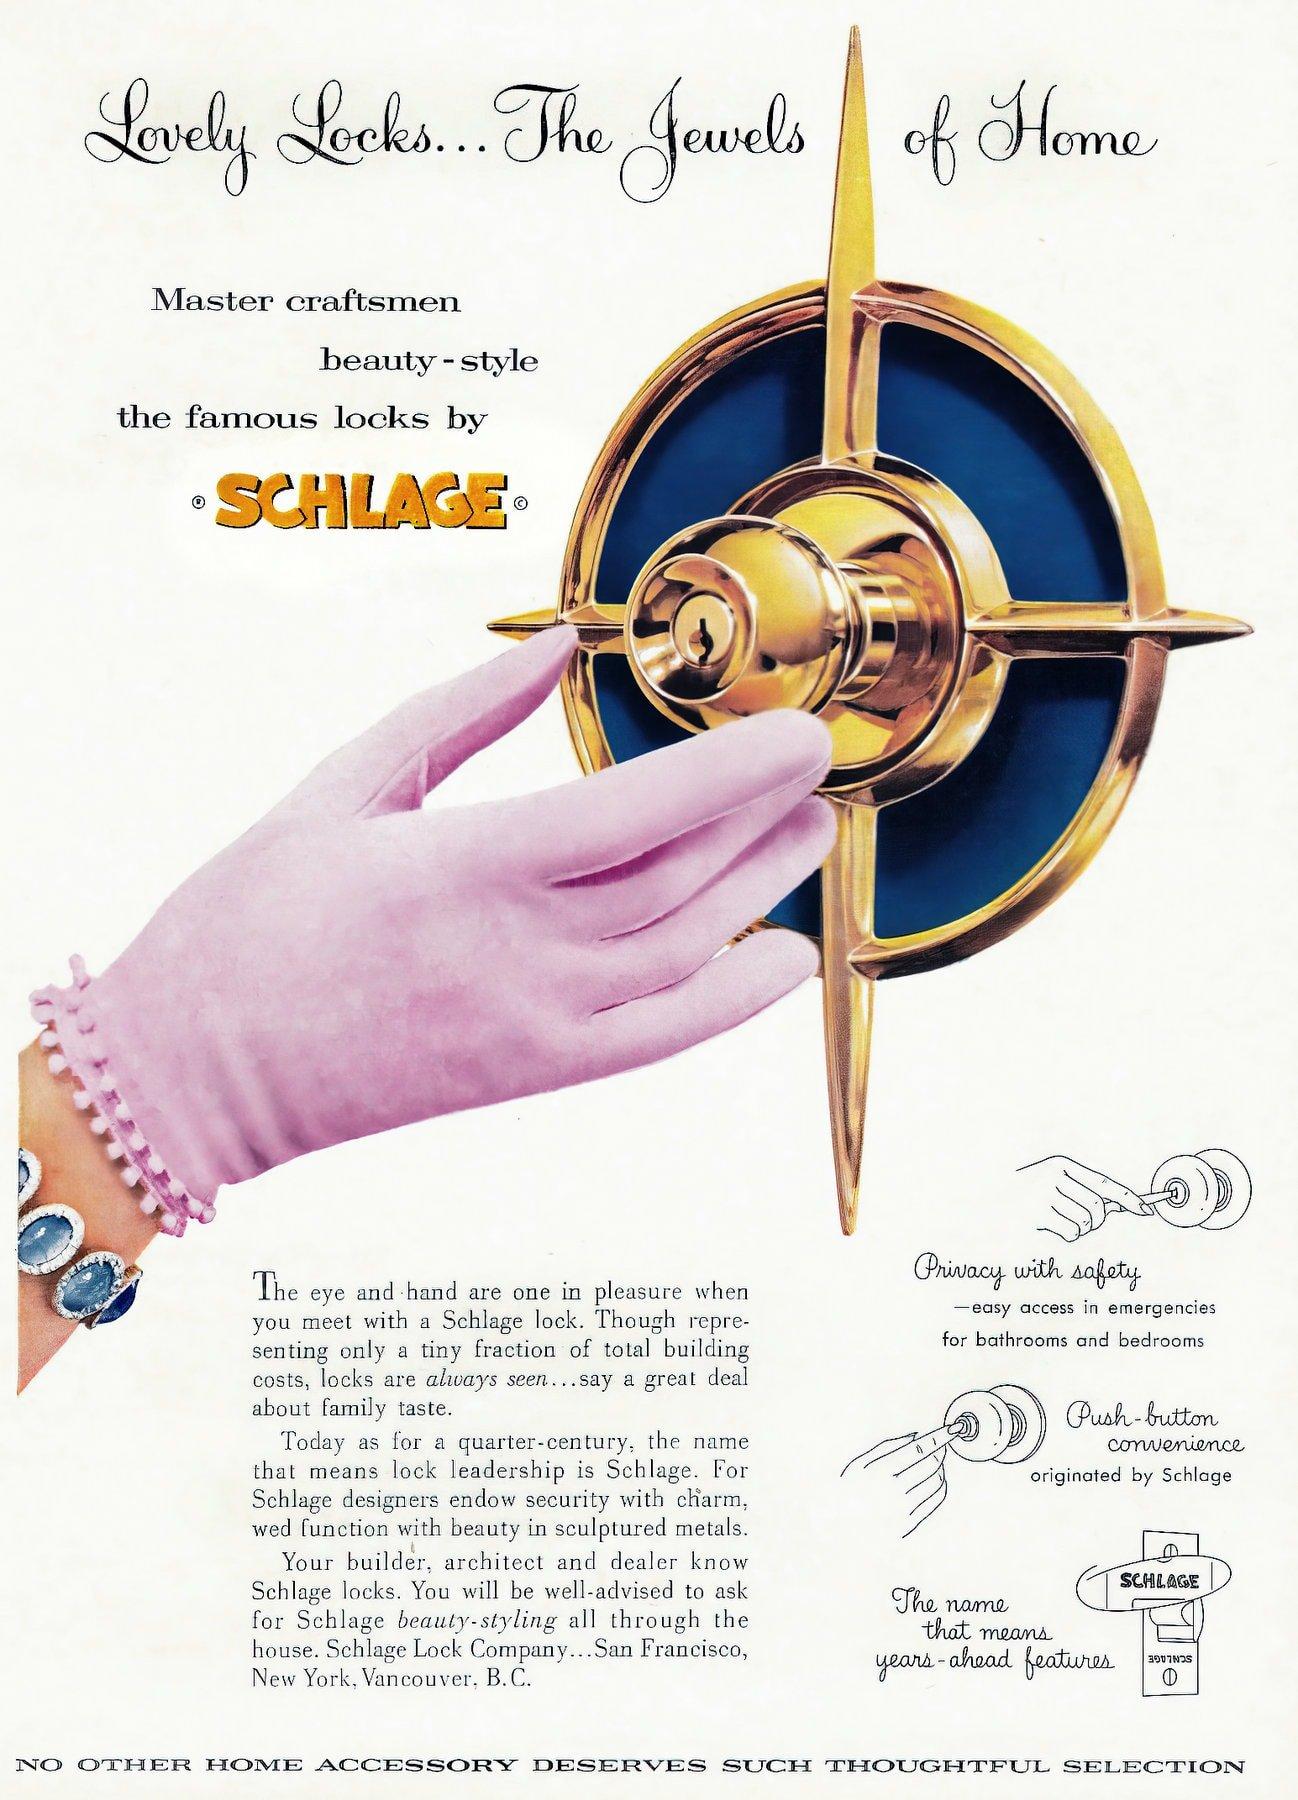 Vintage Schlage iconic starburst design front door handle c1962